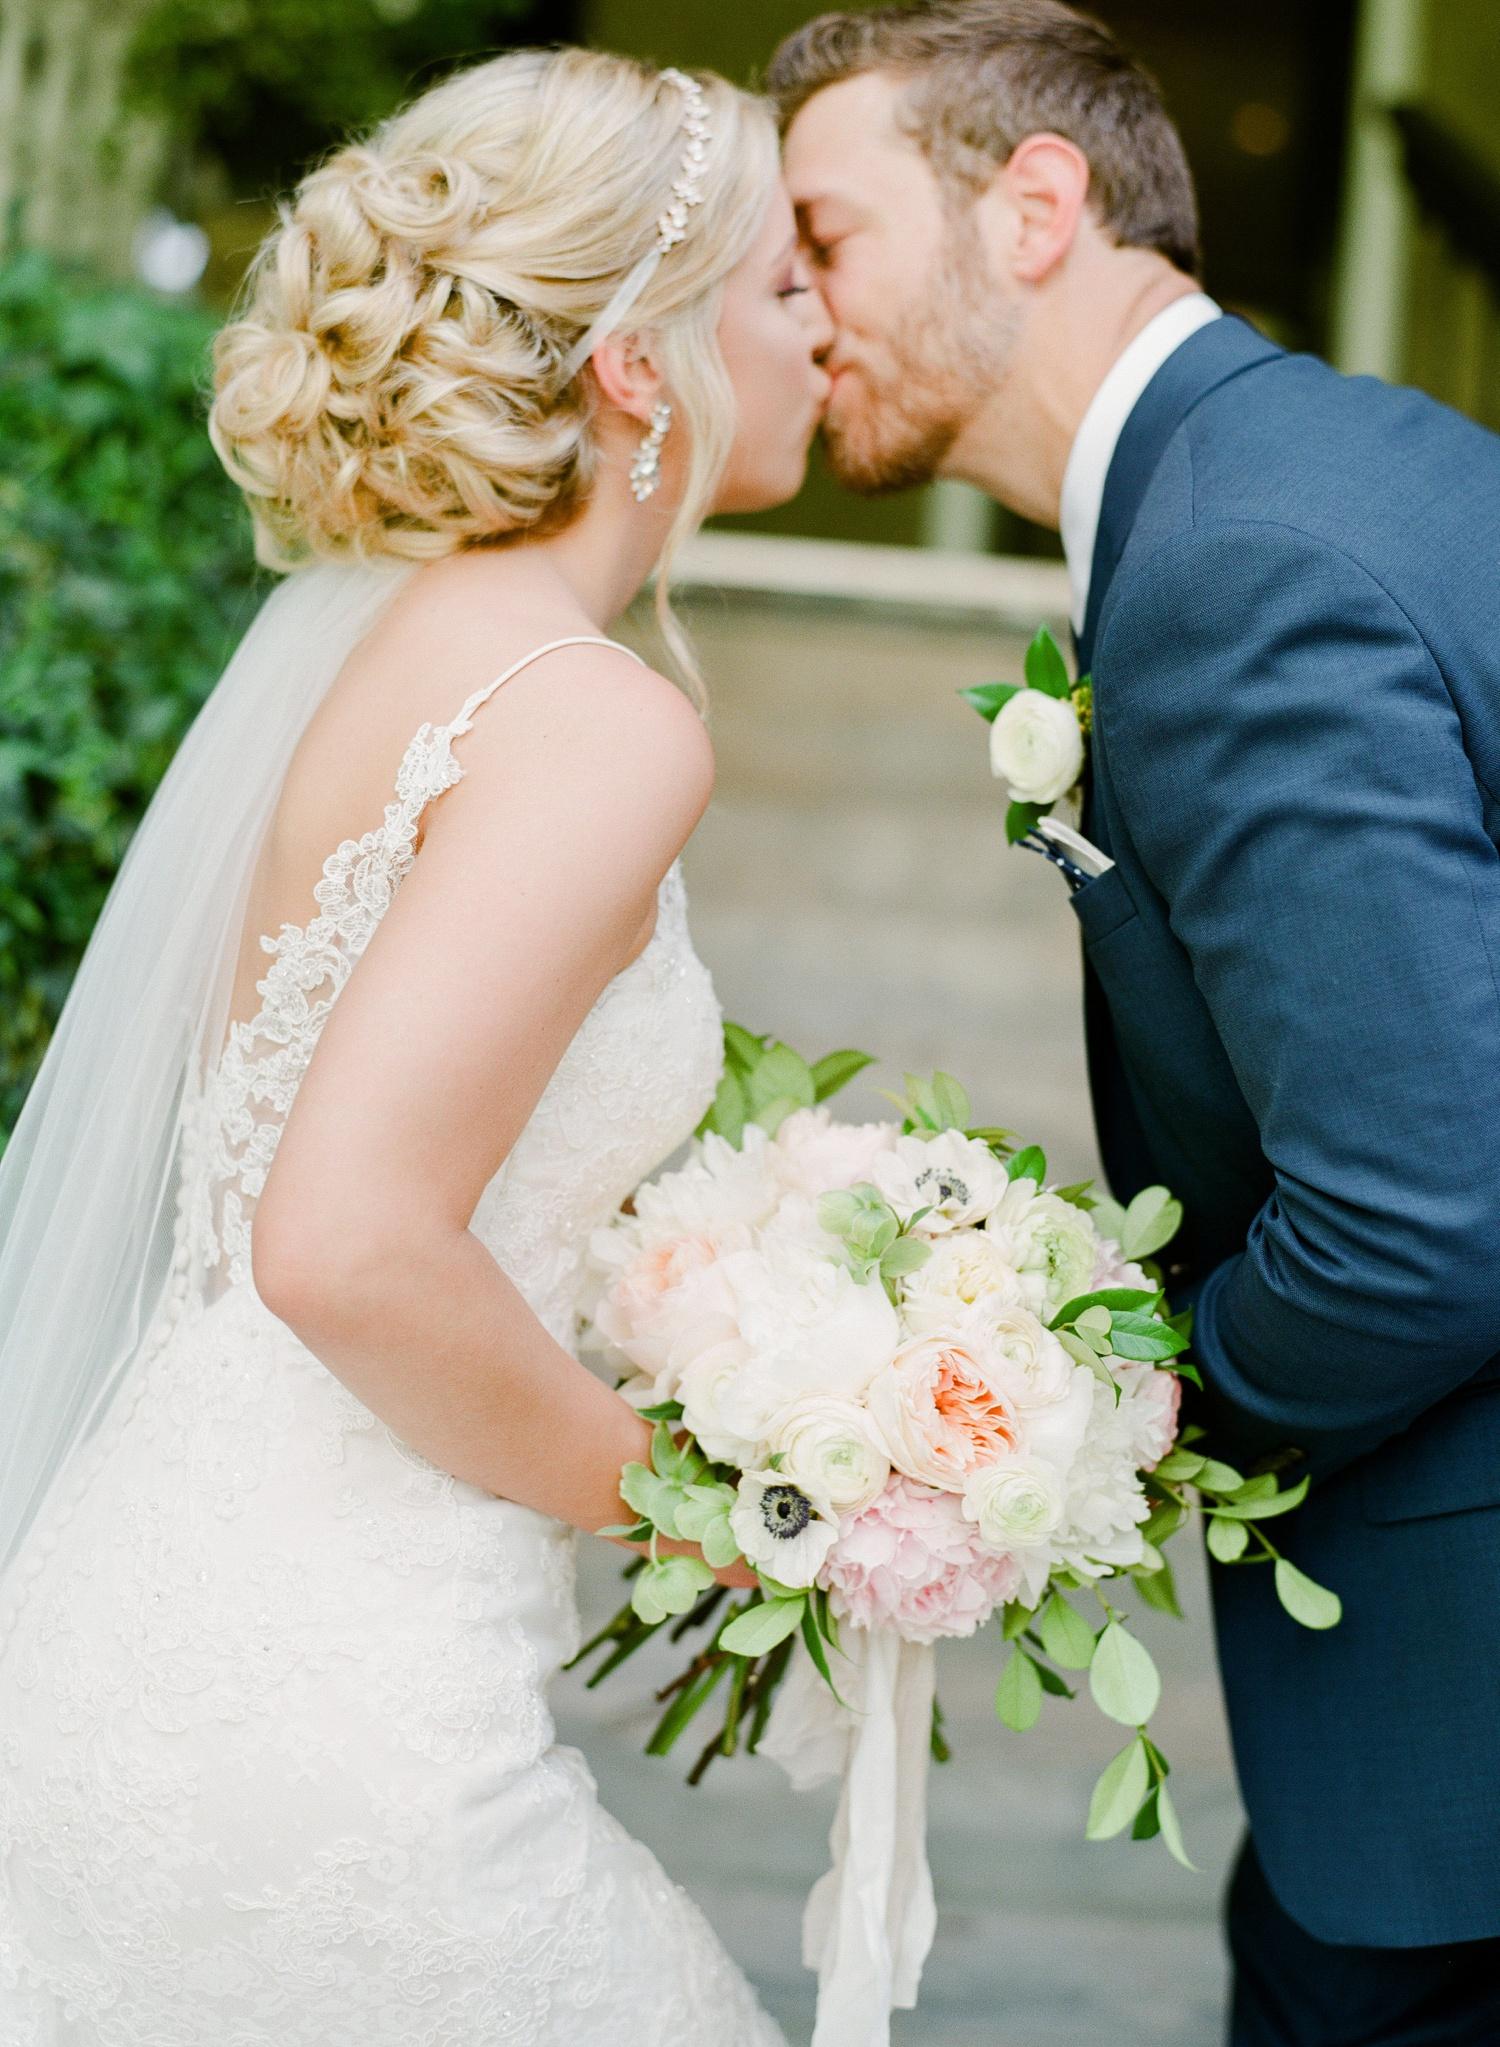 Magnolia-Garden-Southern-Weddings-Magazine_0019.jpg